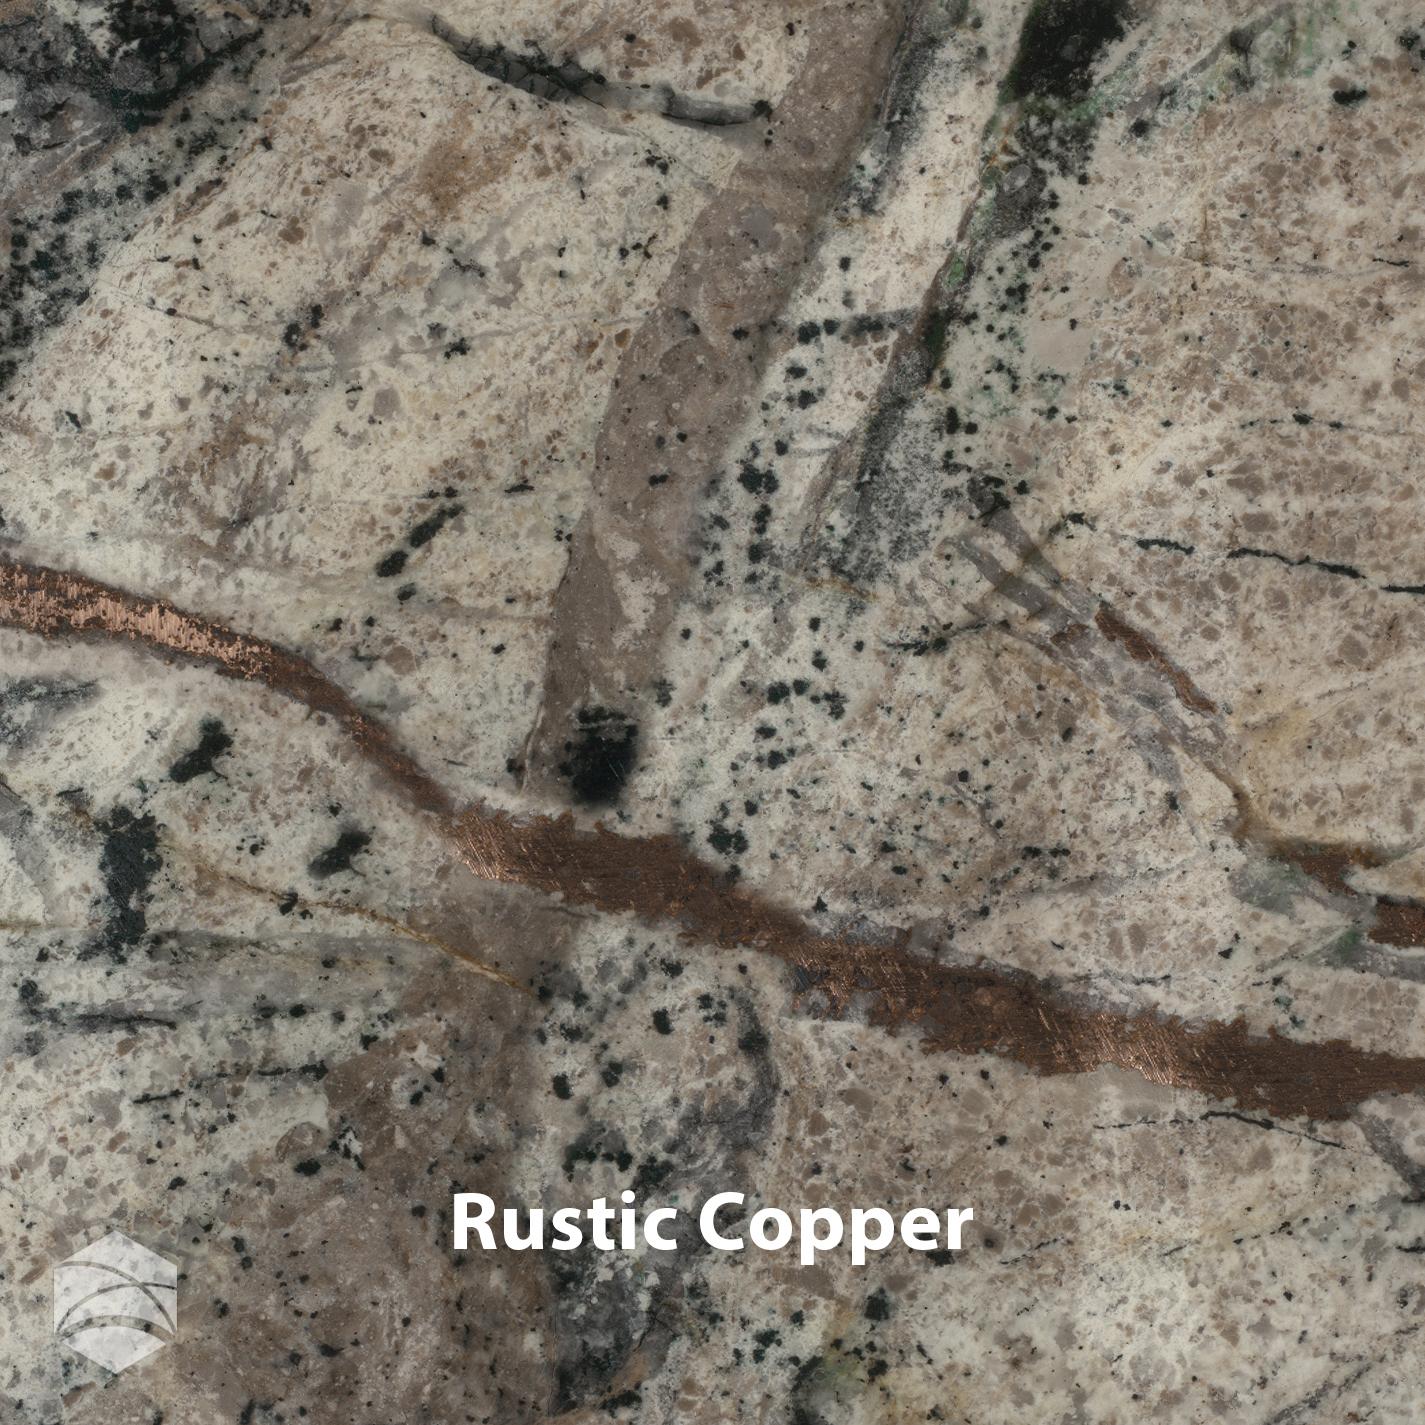 Rustic Copper_V2_14x14.jpg